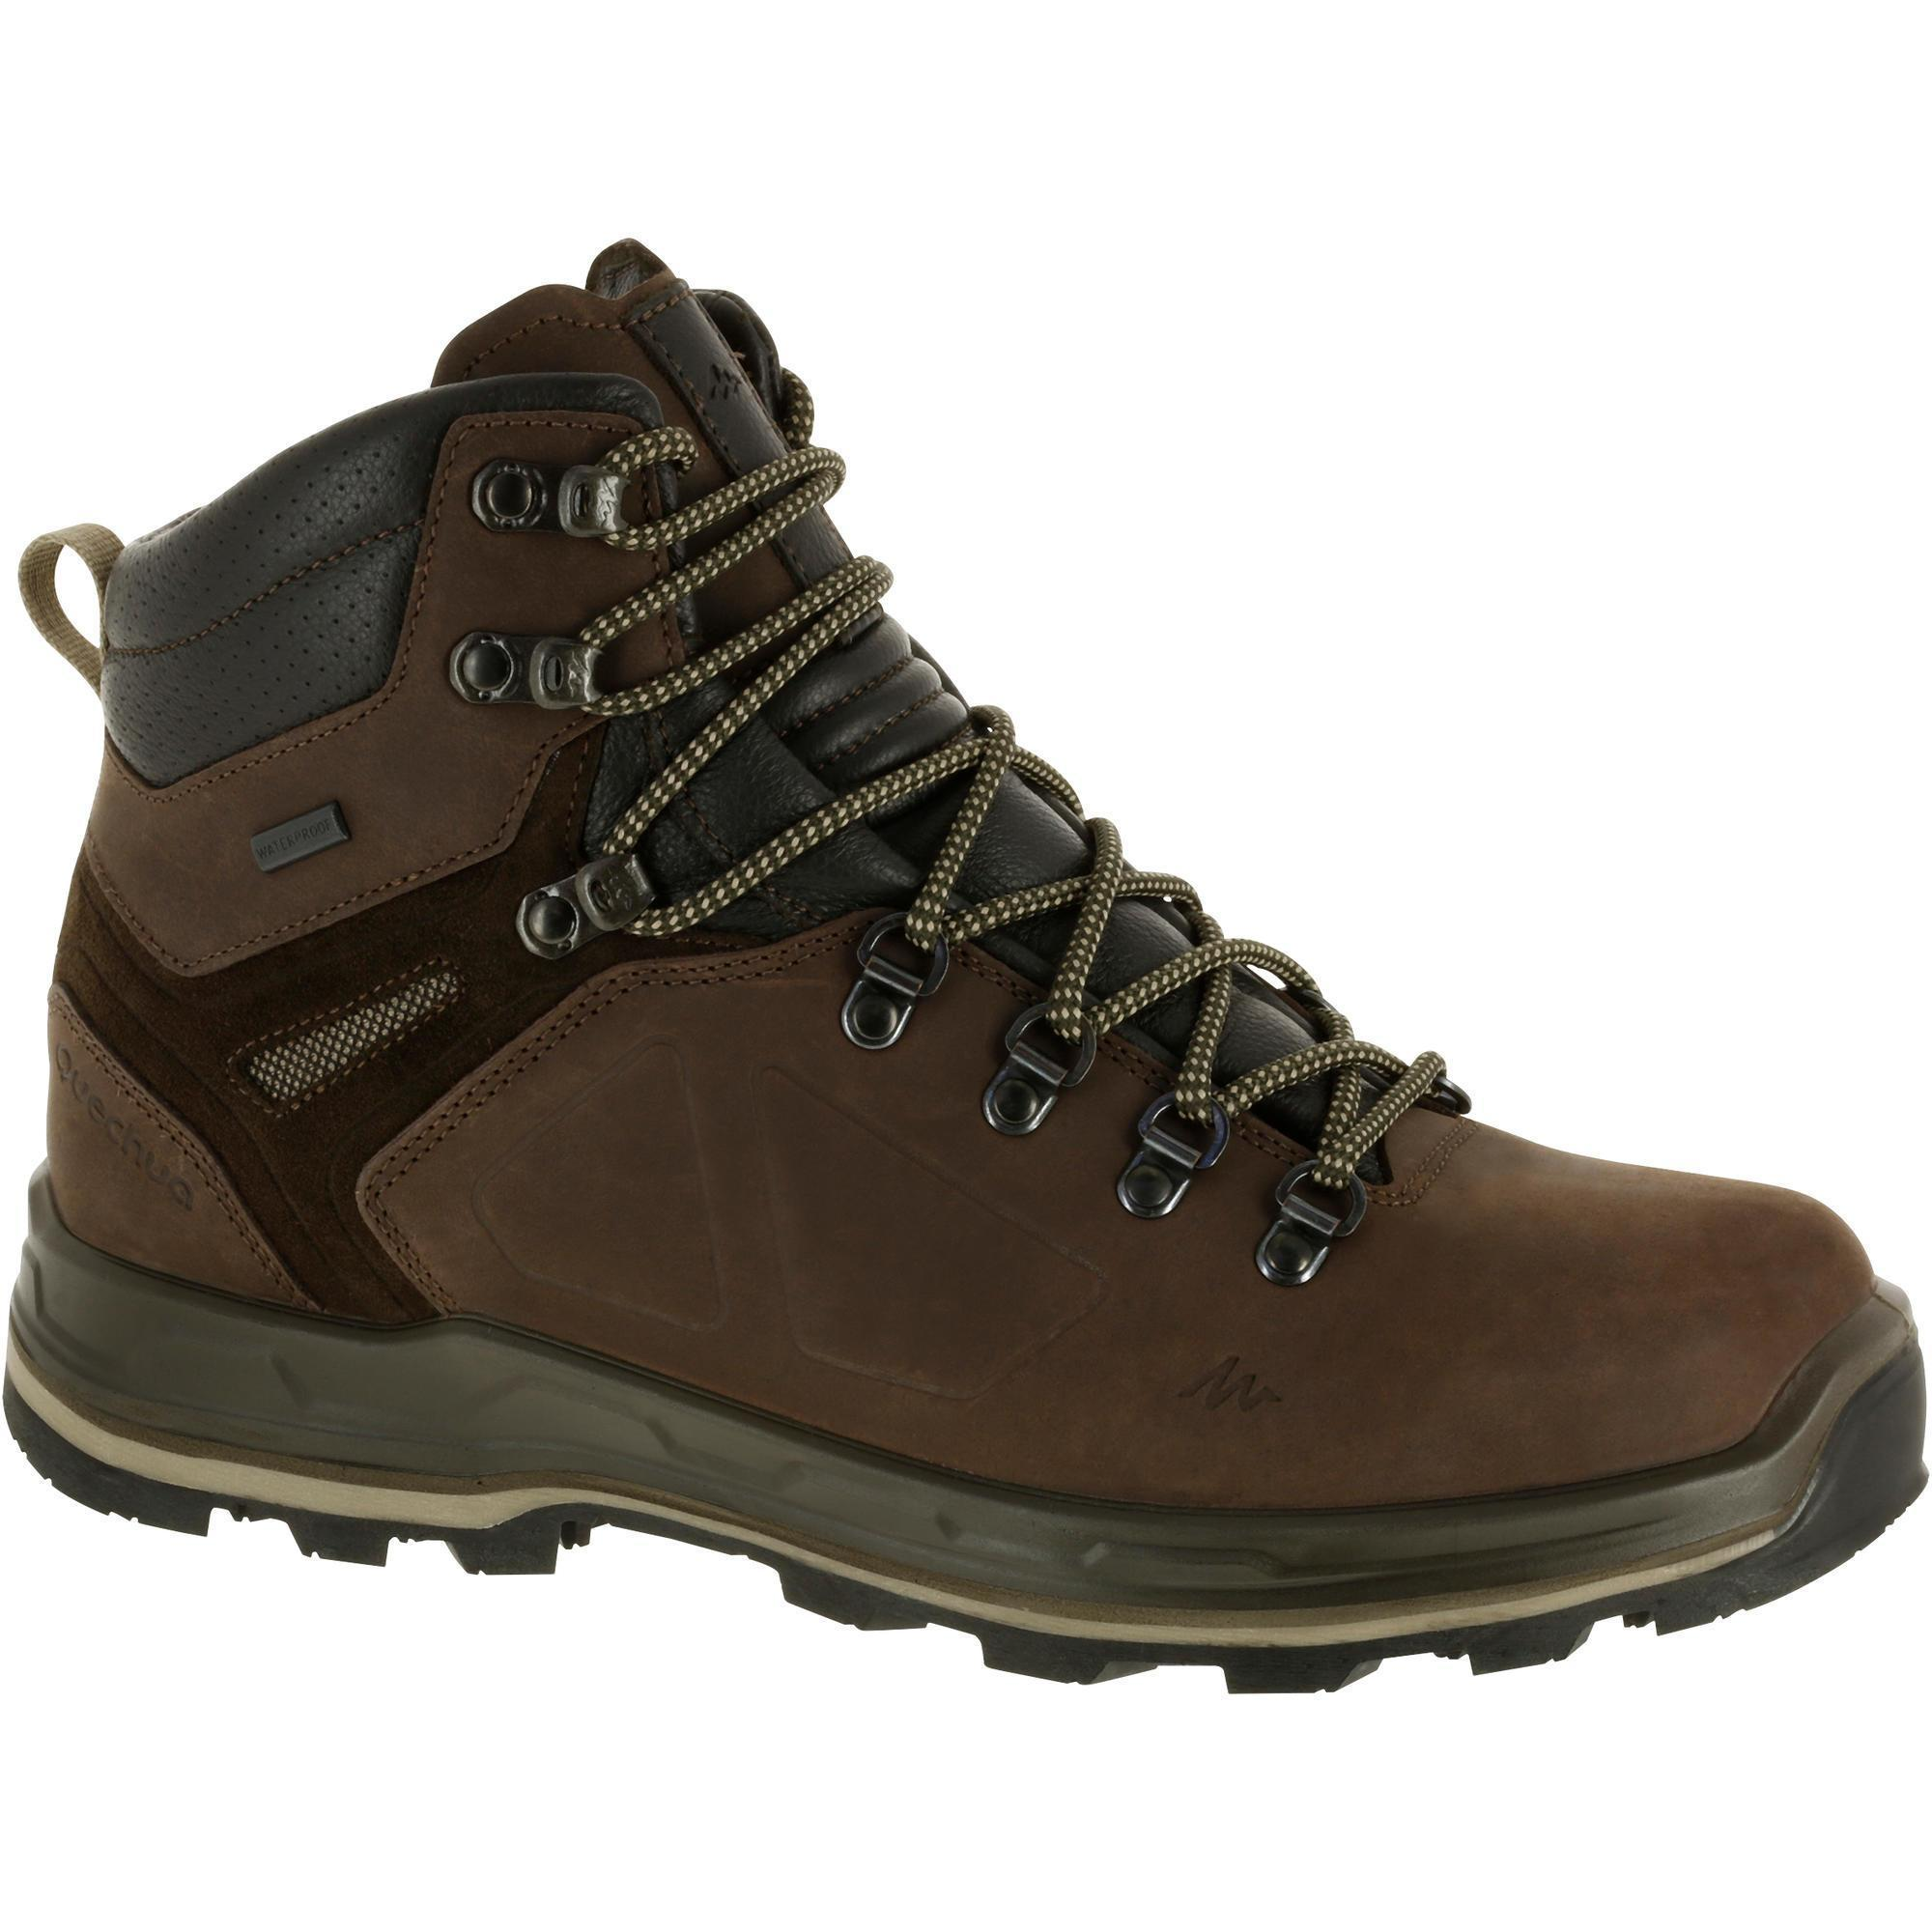 chaussure de trekking trek 500 homme marron quechua. Black Bedroom Furniture Sets. Home Design Ideas